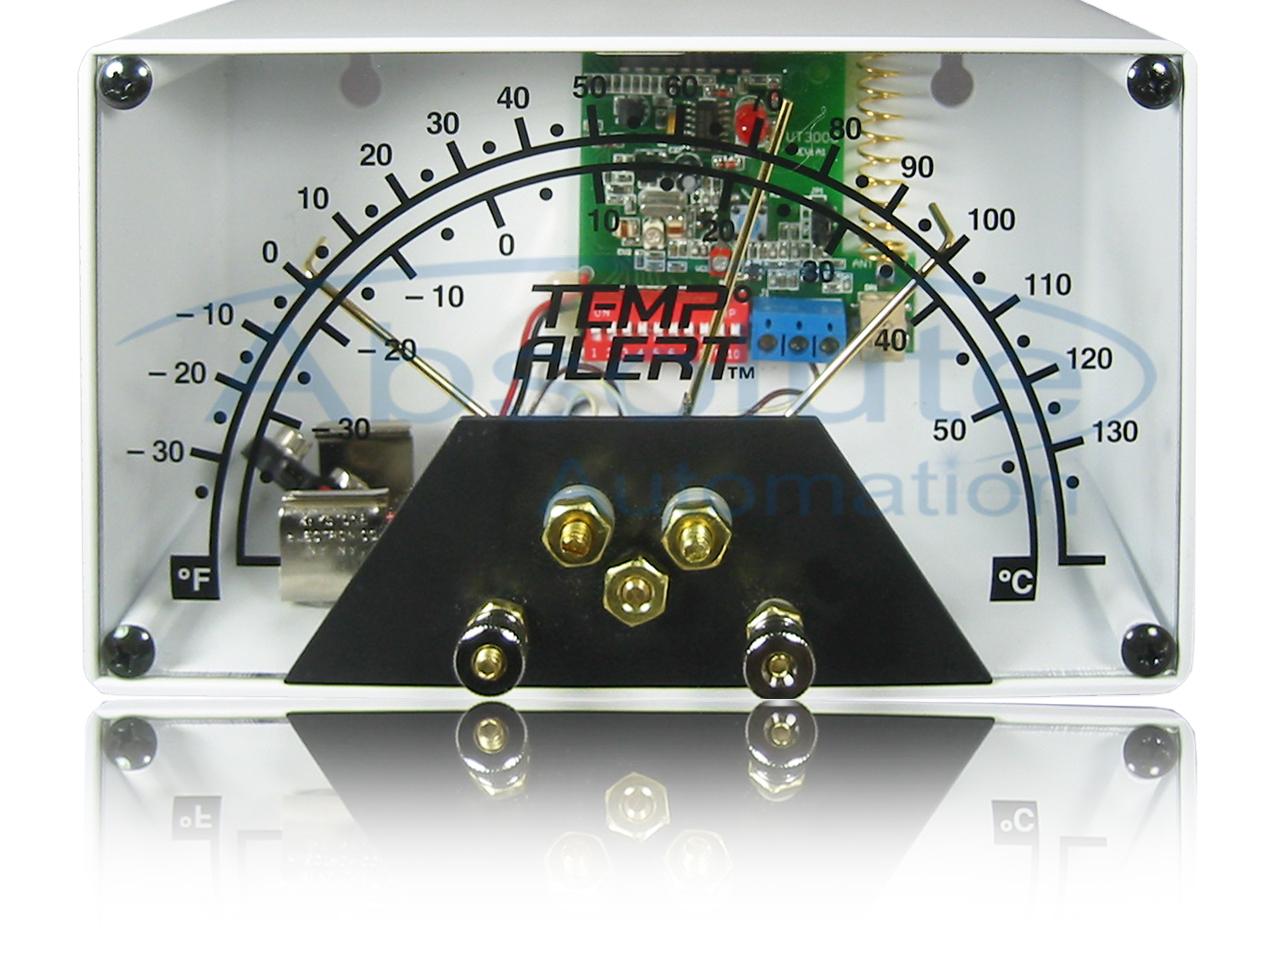 New Project: Wireless TemperatureAlert